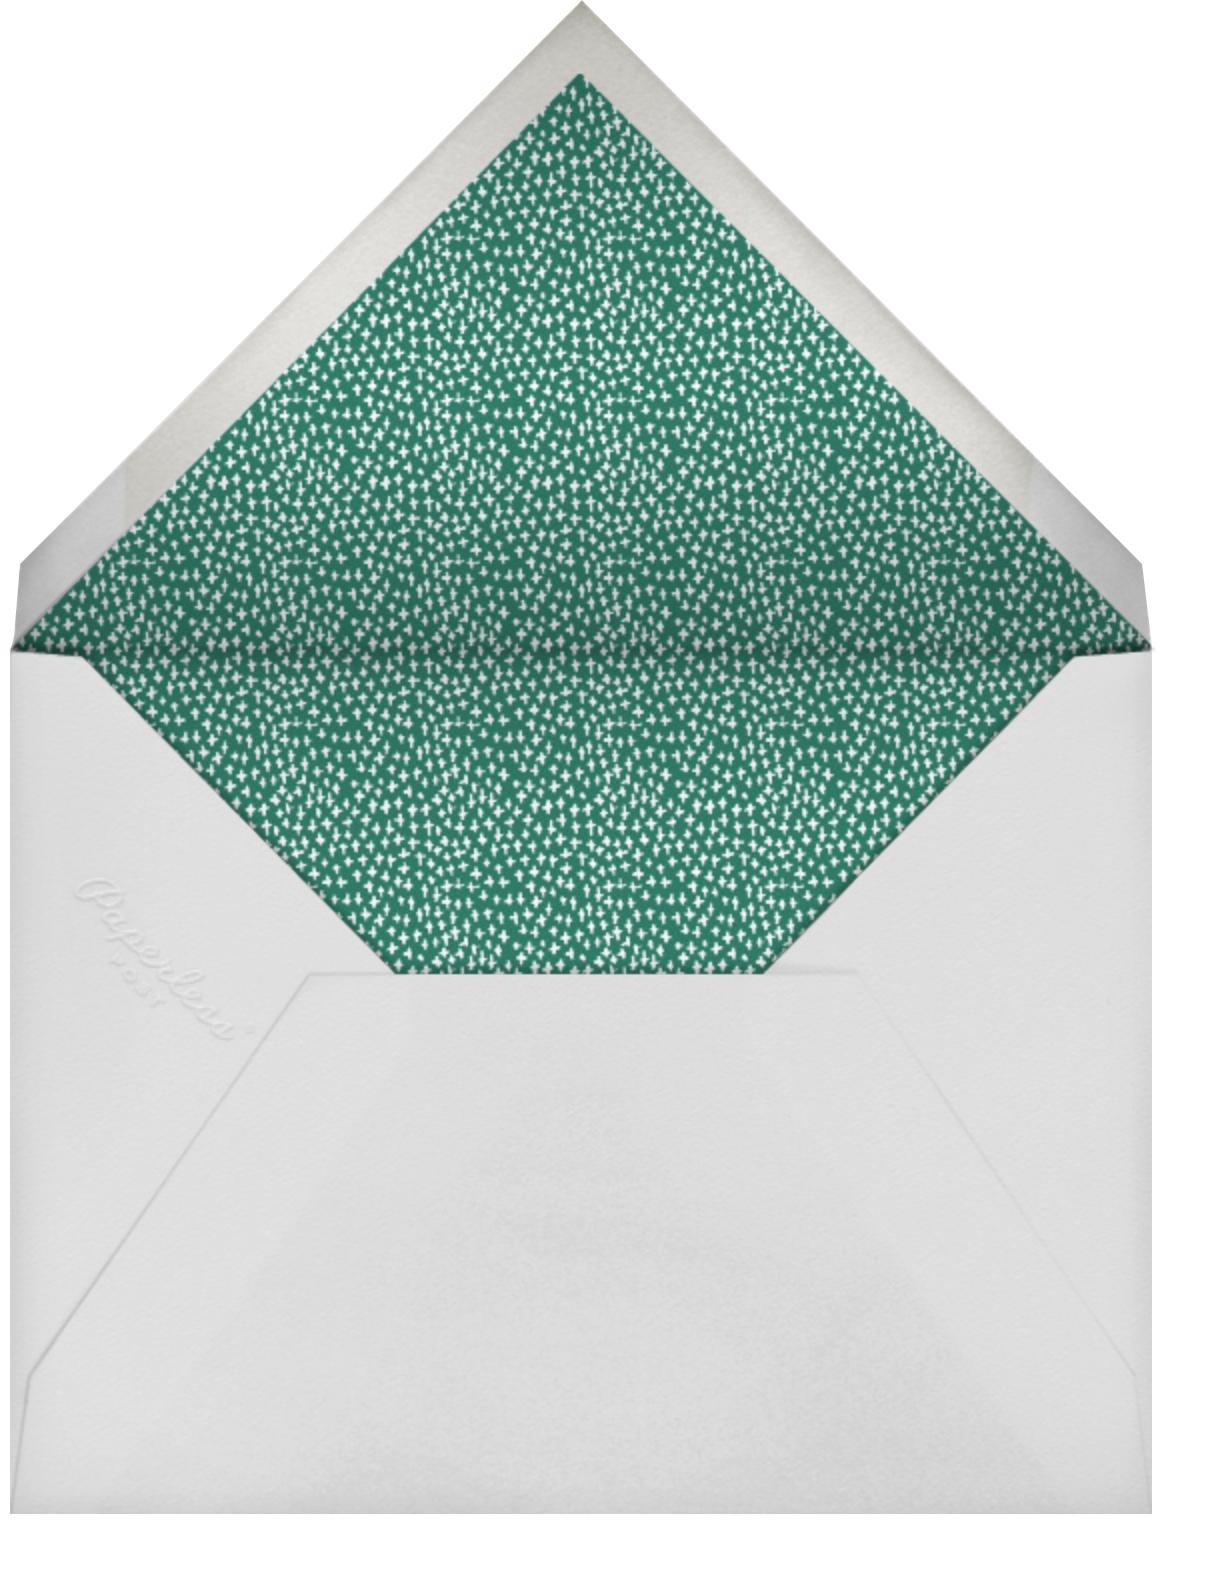 Sprawling Vines - Mr. Boddington's Studio - Envelope